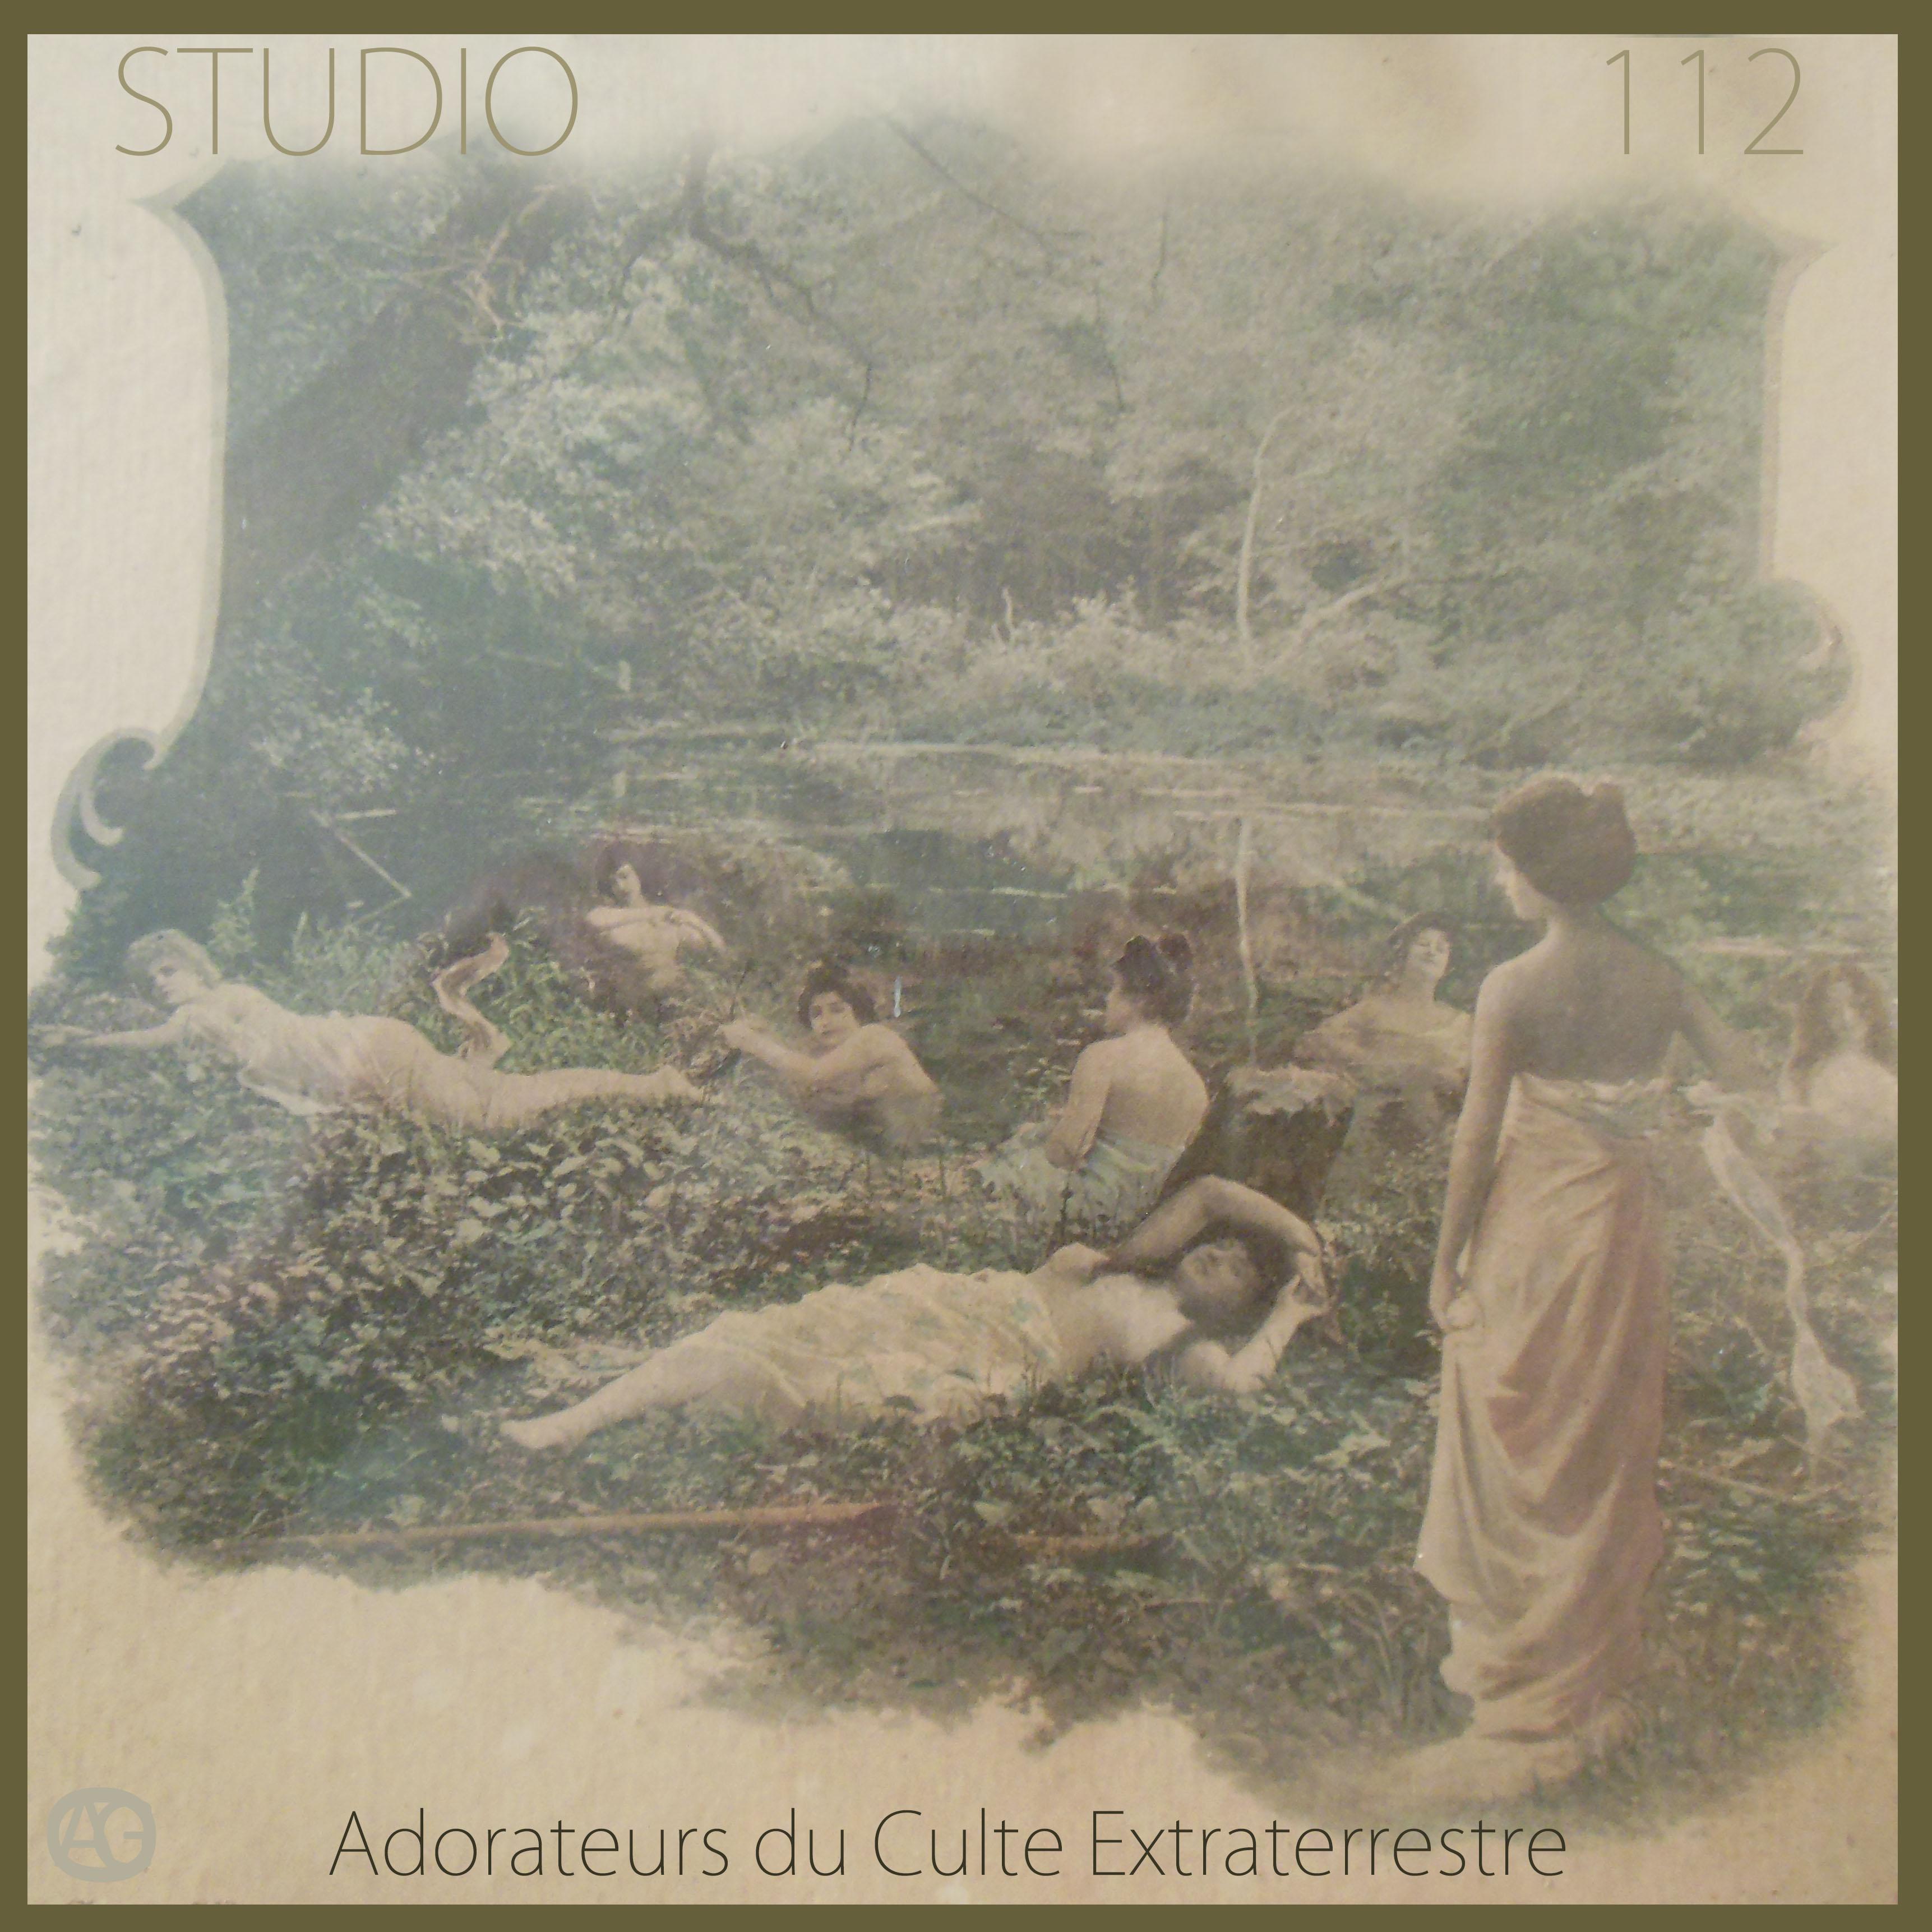 Studio 112 – Adorateurs Du Culte Extraterrestre